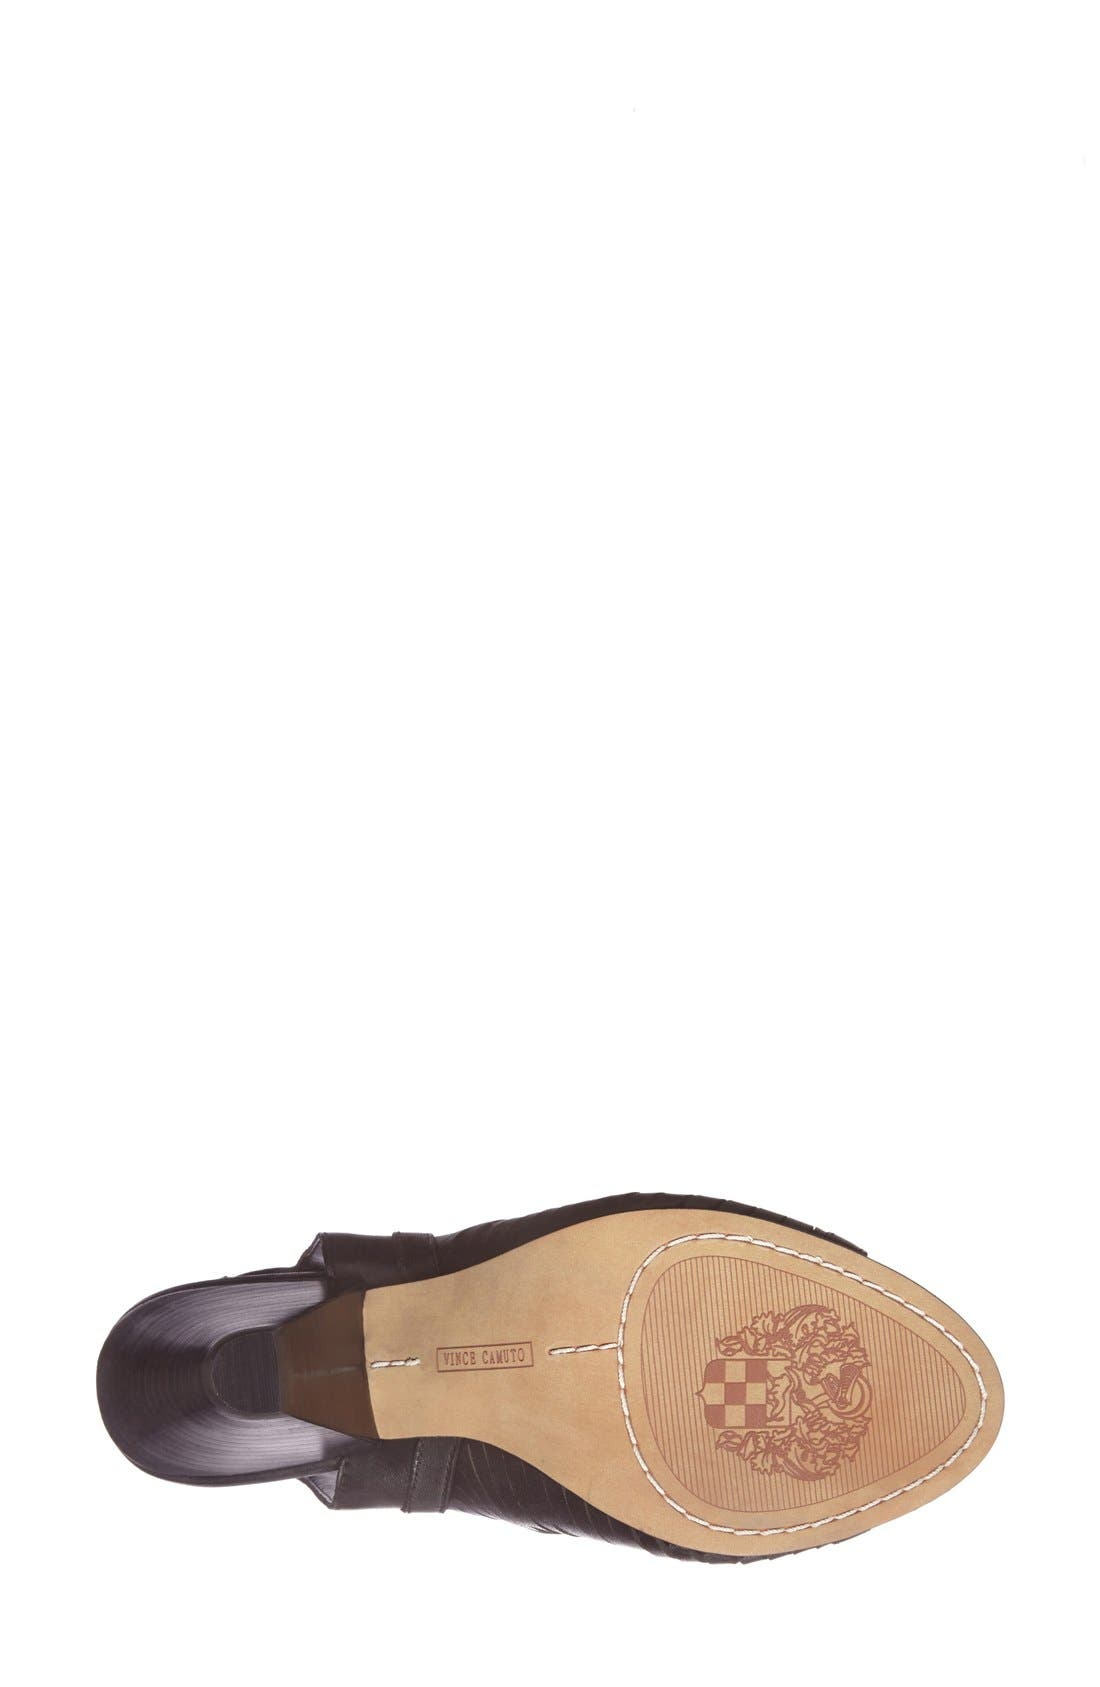 'Emore' Leather Sandal,                             Alternate thumbnail 4, color,                             001